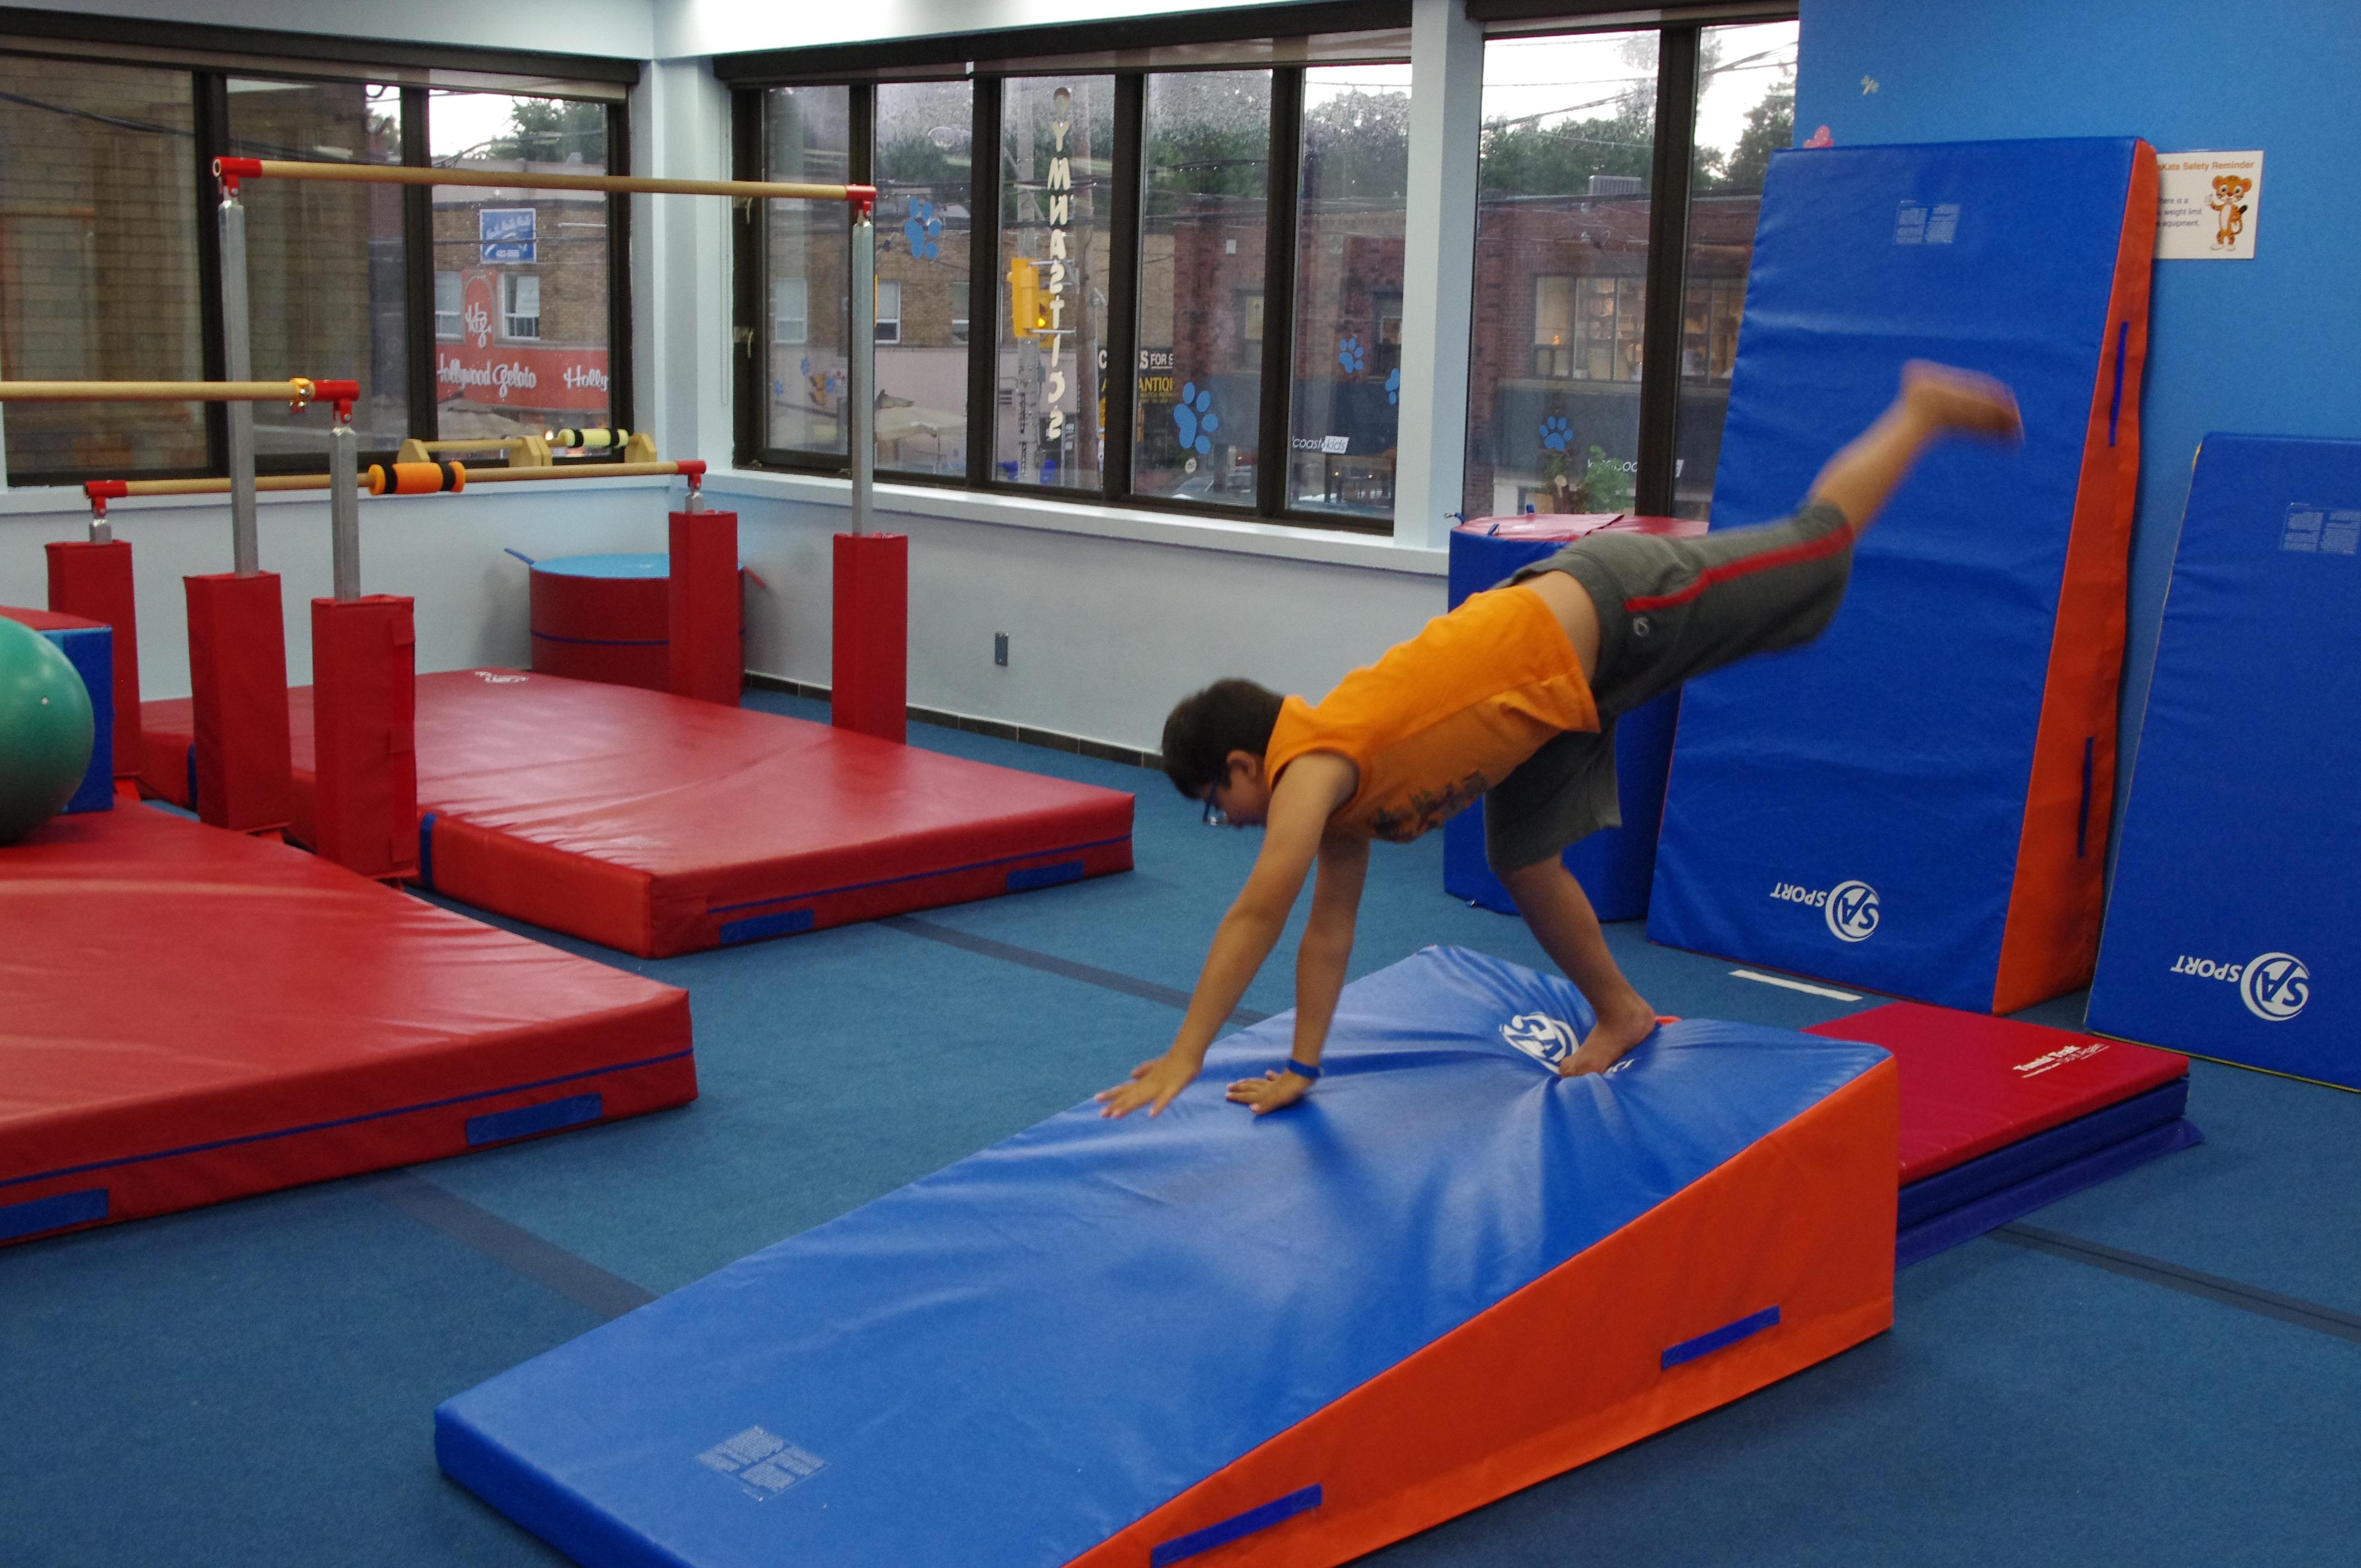 Cartwheels Down Incline